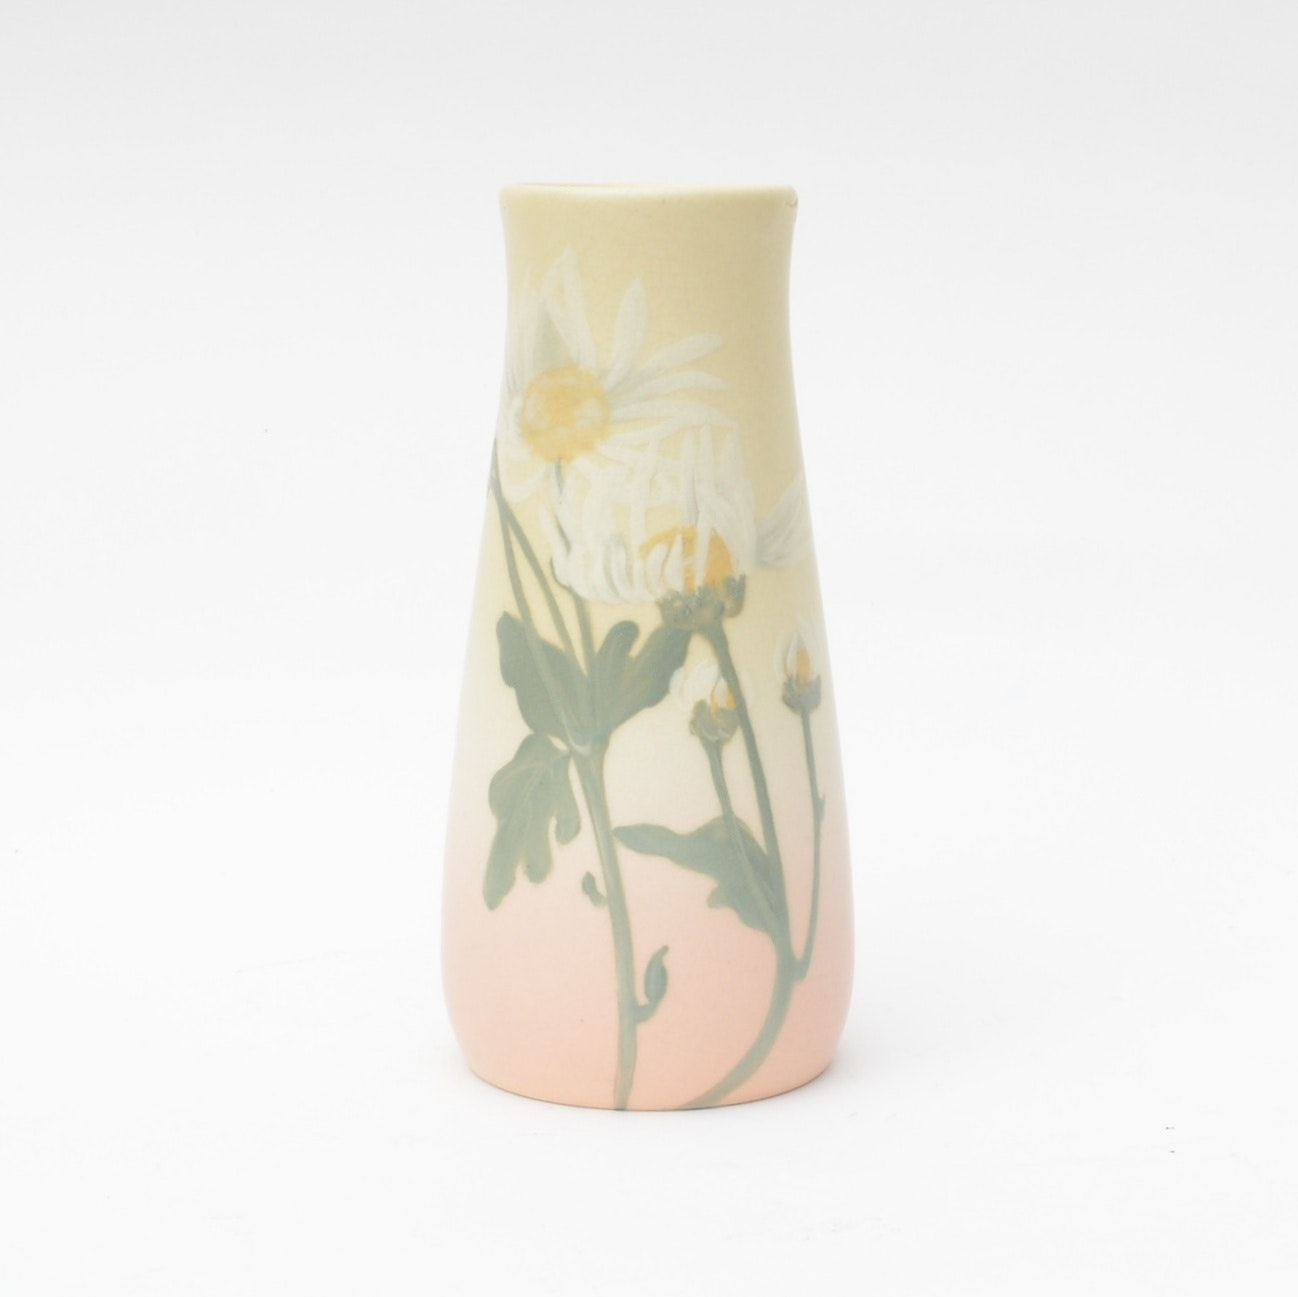 1906 Edith Noonan Rookwood Vase